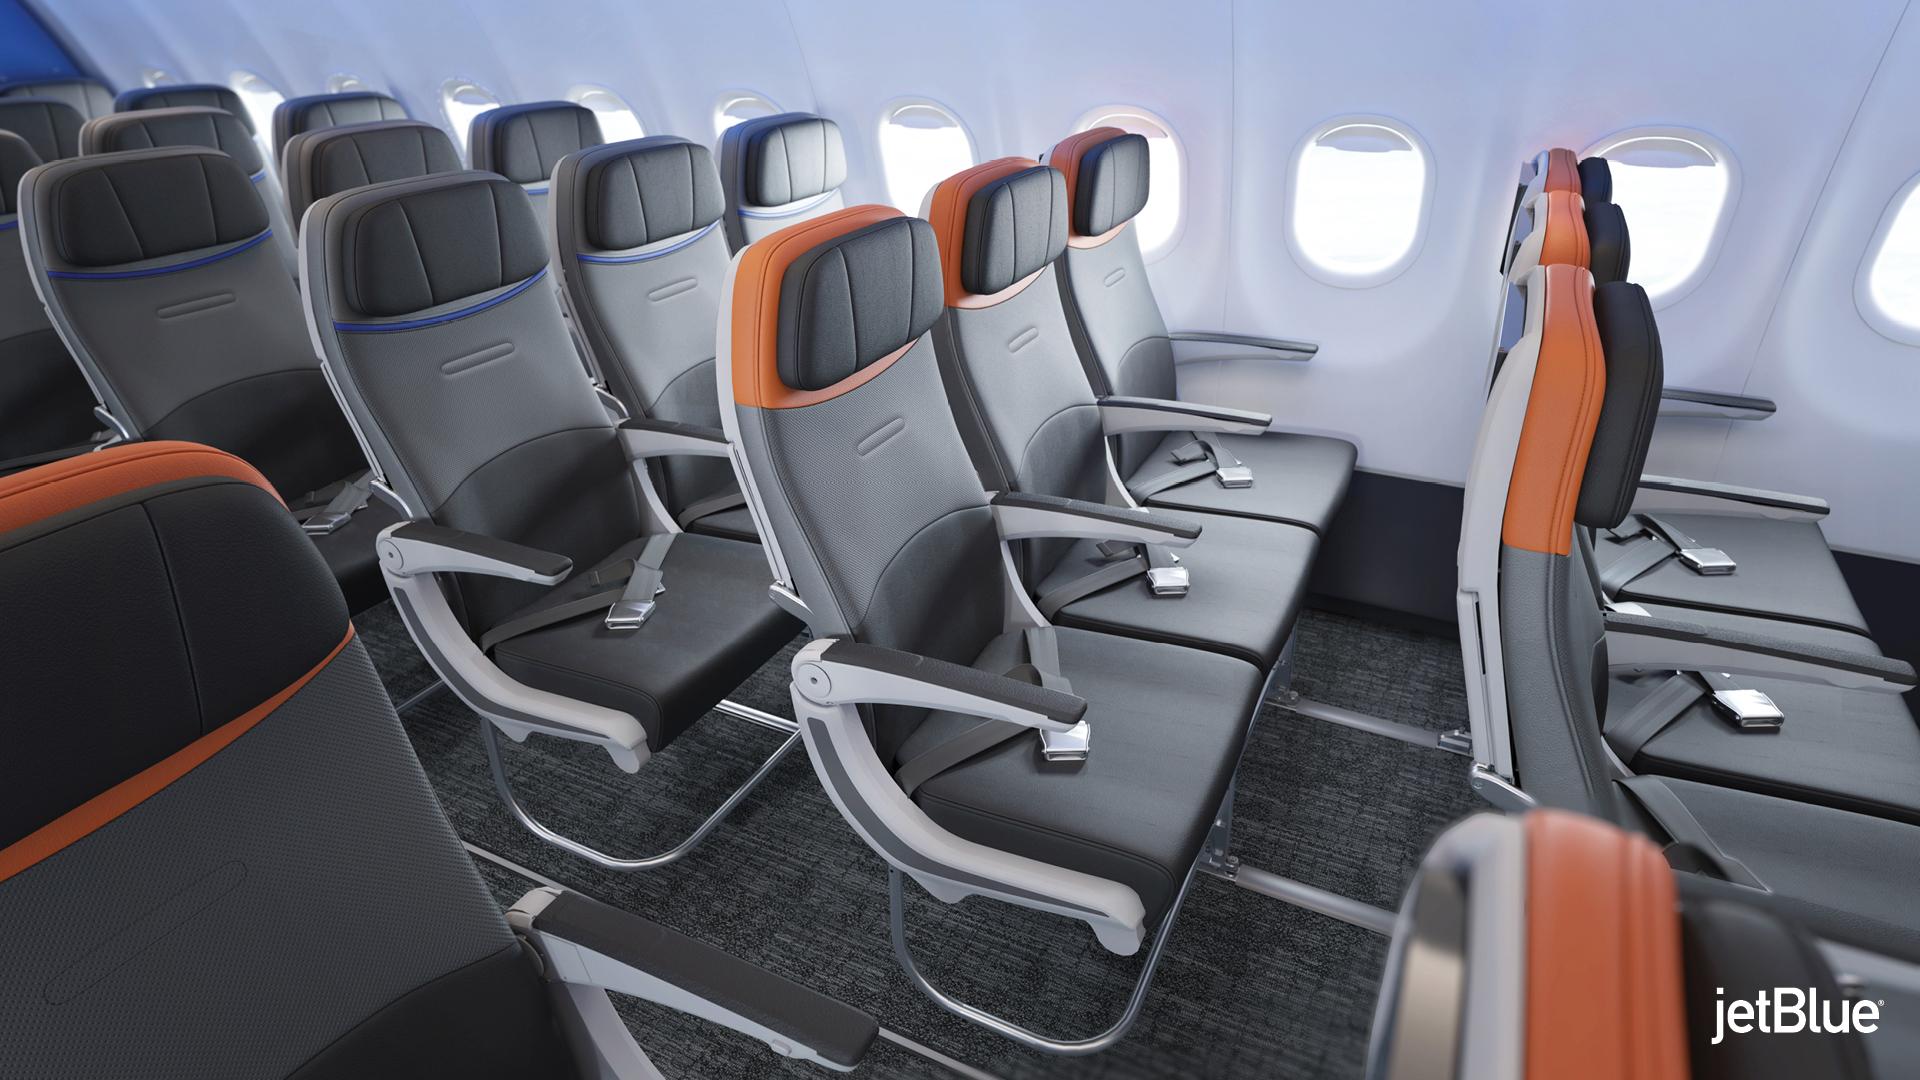 JetBlue Is Finally Ready to Refurbish Its Airbus A320 Fleet